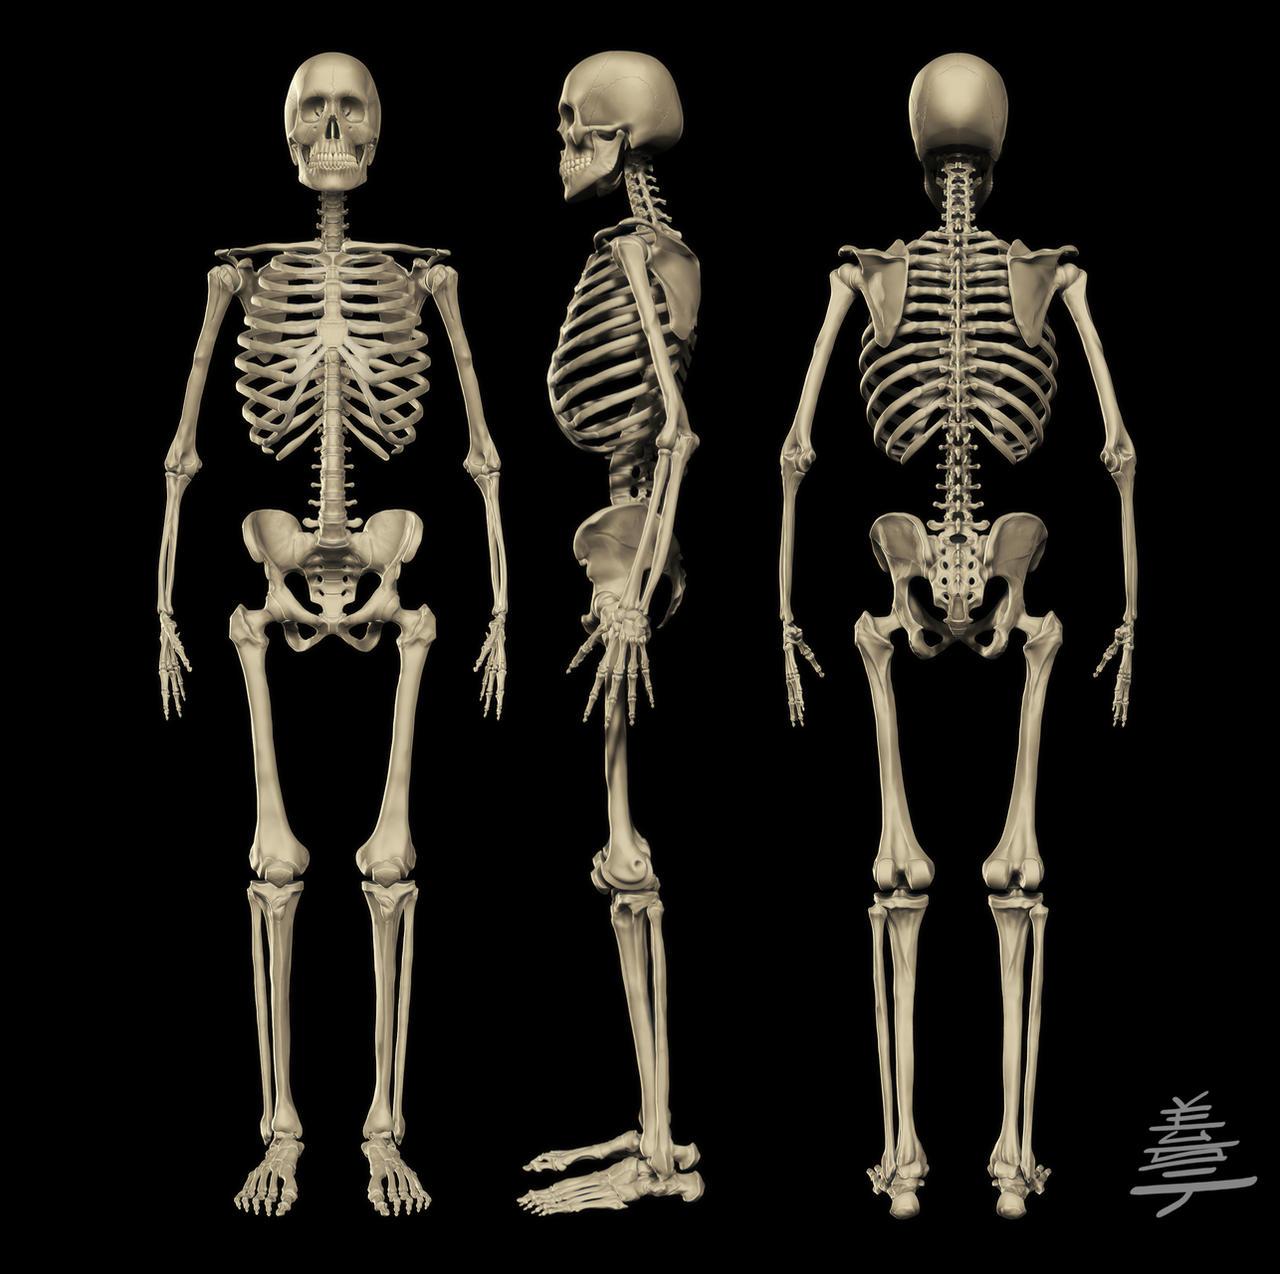 Anatomy - MALE Skeleton by Veus-T on DeviantArt